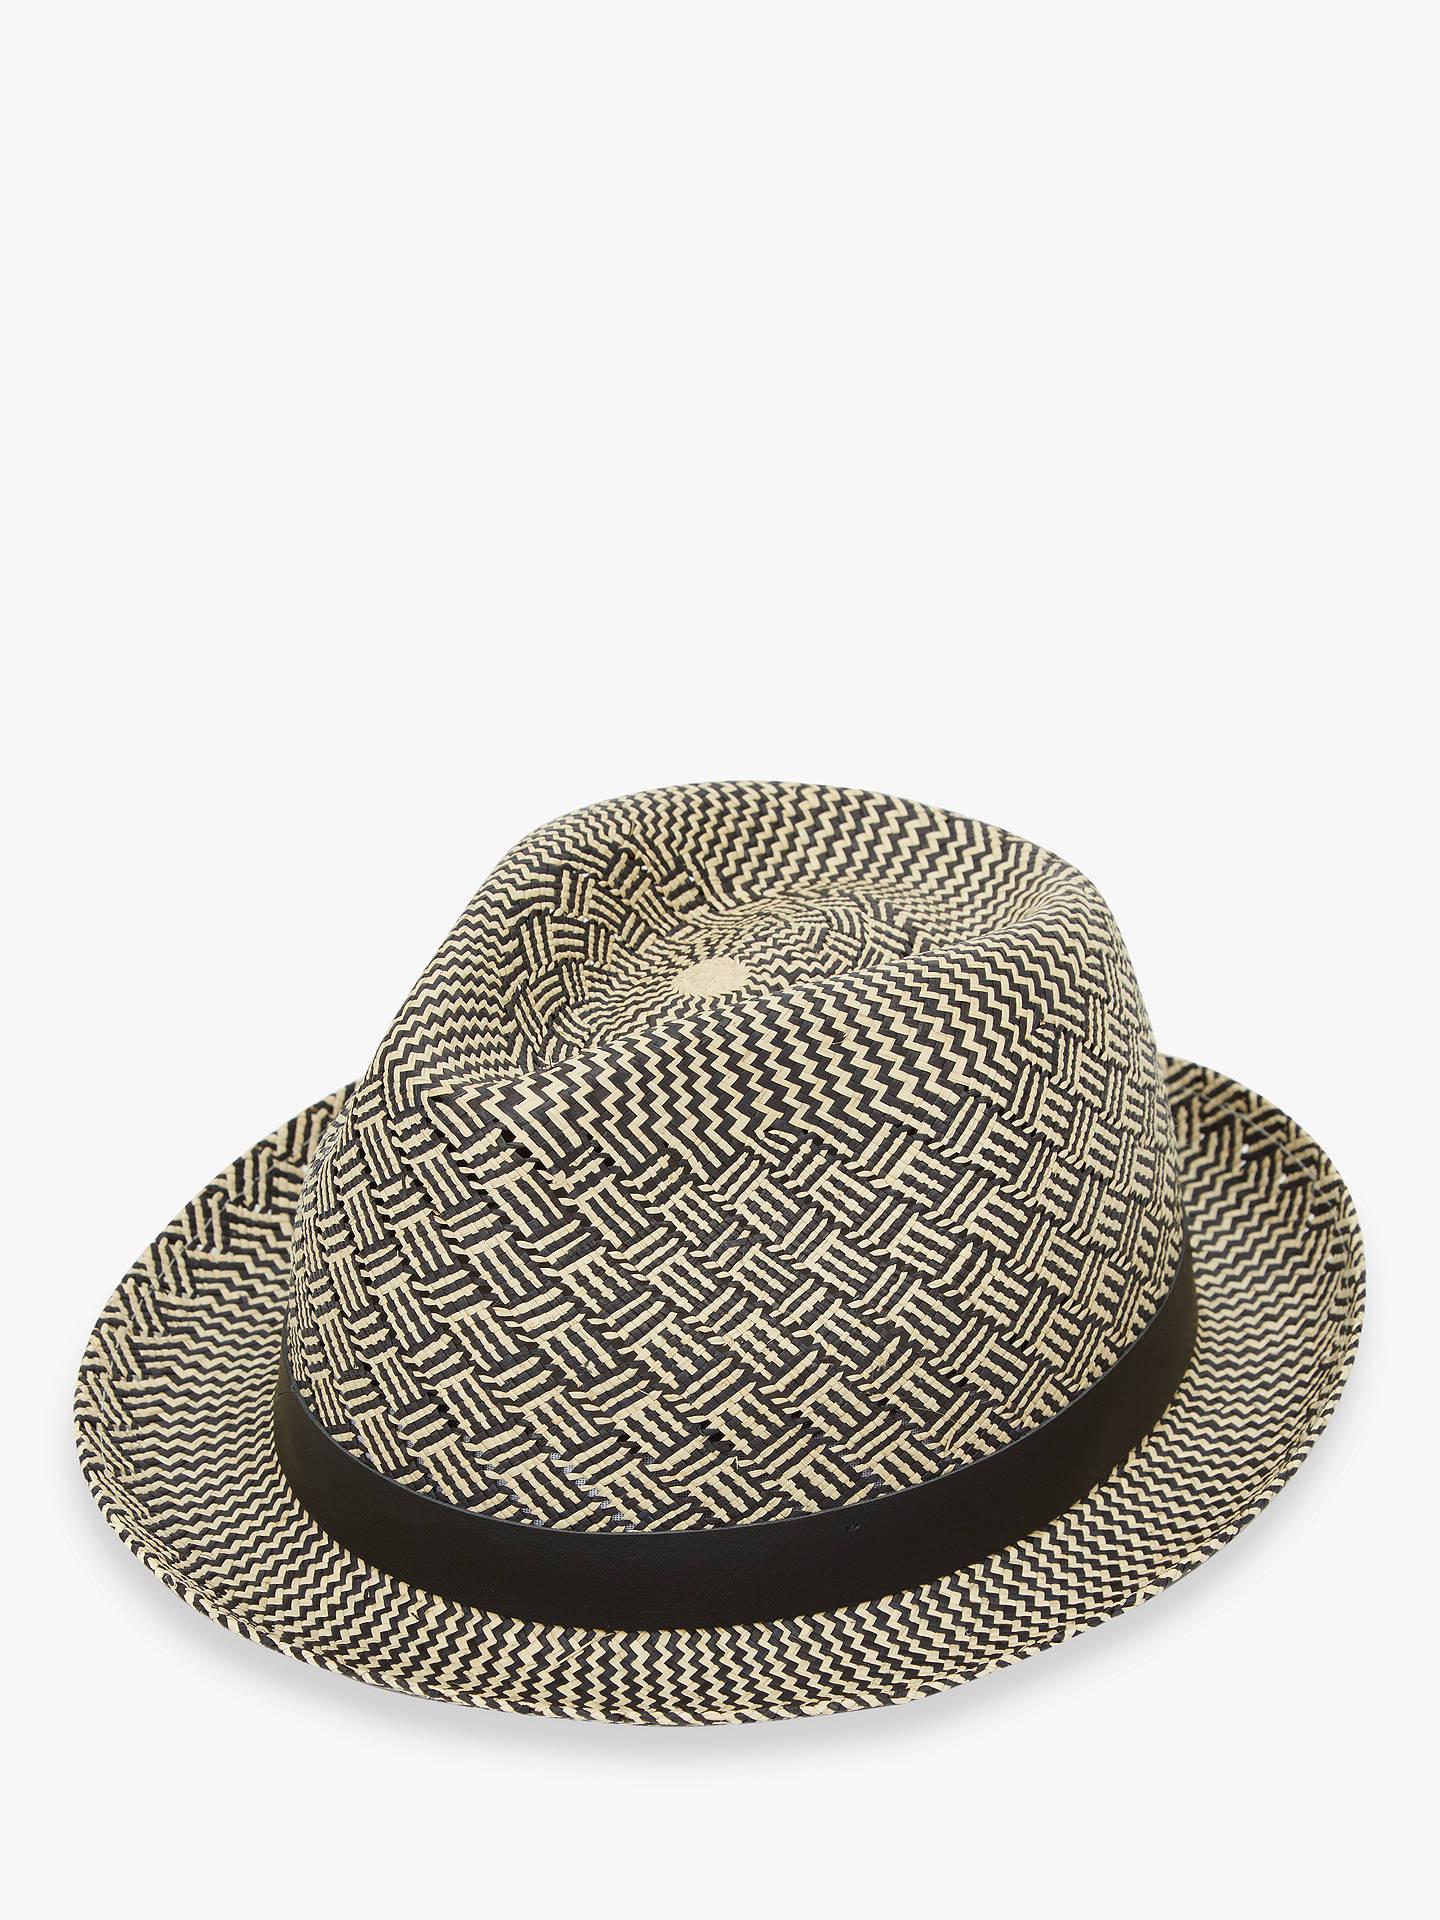 213c53926 Christys' Charlie Parquet Panama Hat, Black at John Lewis & Partners